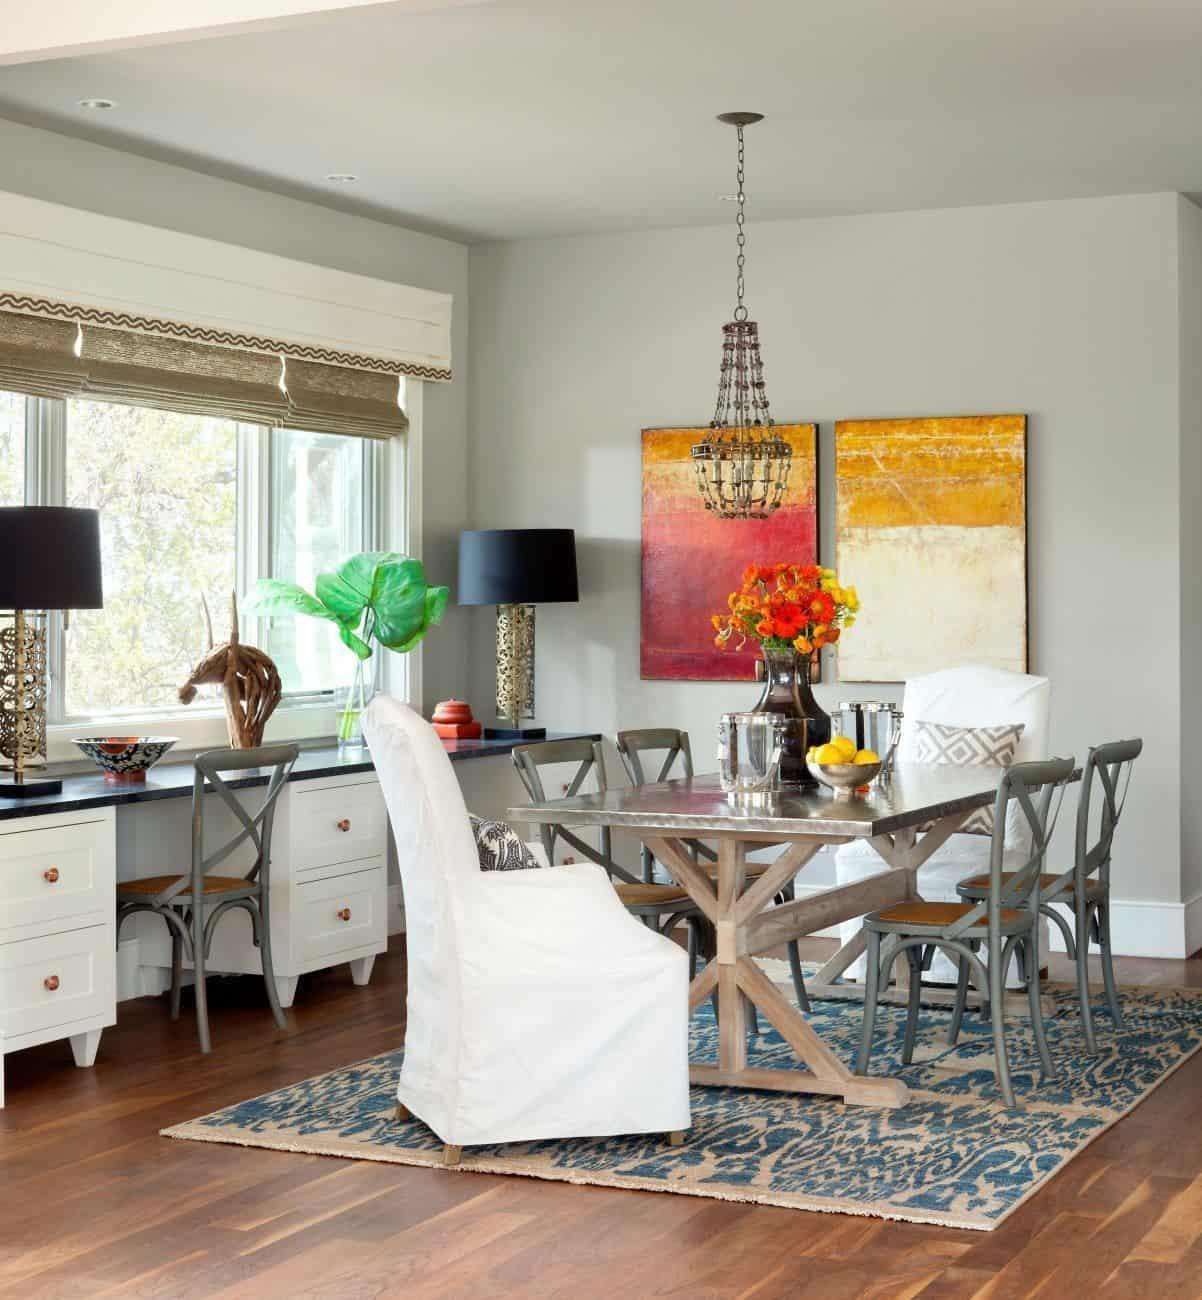 Boulder Residence-Andrea Schumacher Interiors-09-1 Kindesign